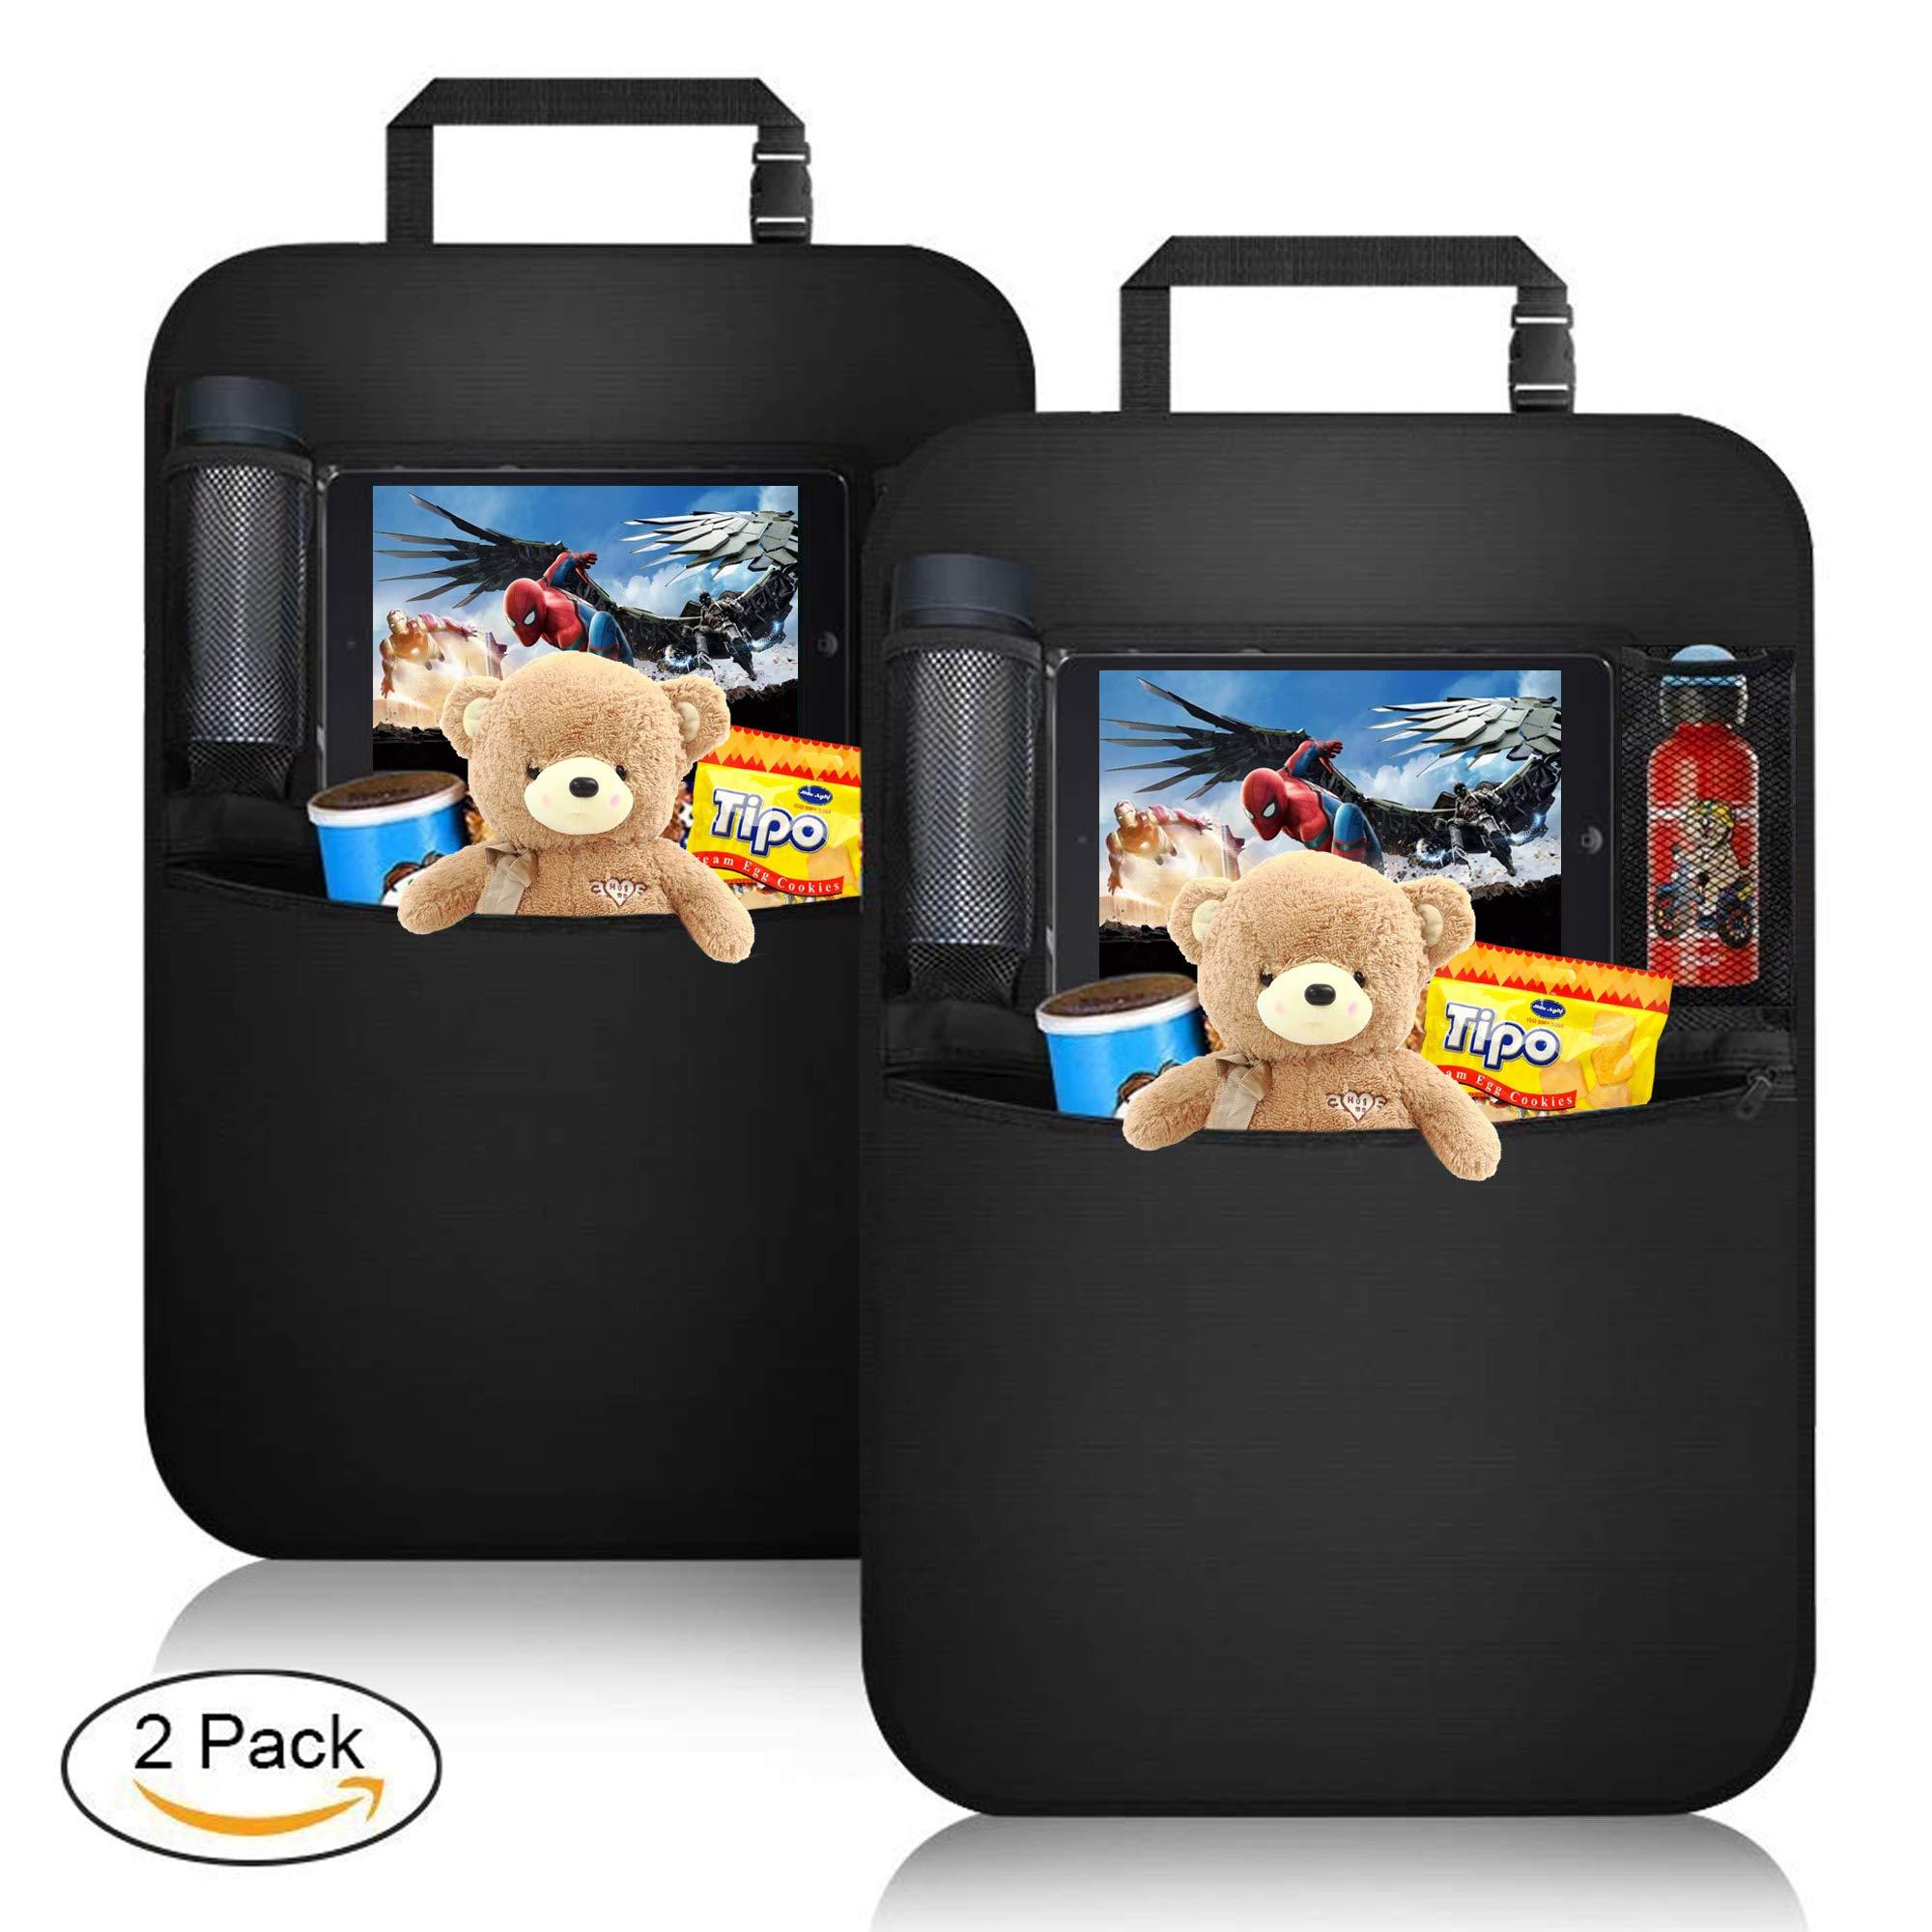 KIPIDA Car Back Seat Organizer Protector 2 Pack, Waterproof Kick Mats,Clear Touch Screen Tablet Holder Large Storage Pockets-【Black】